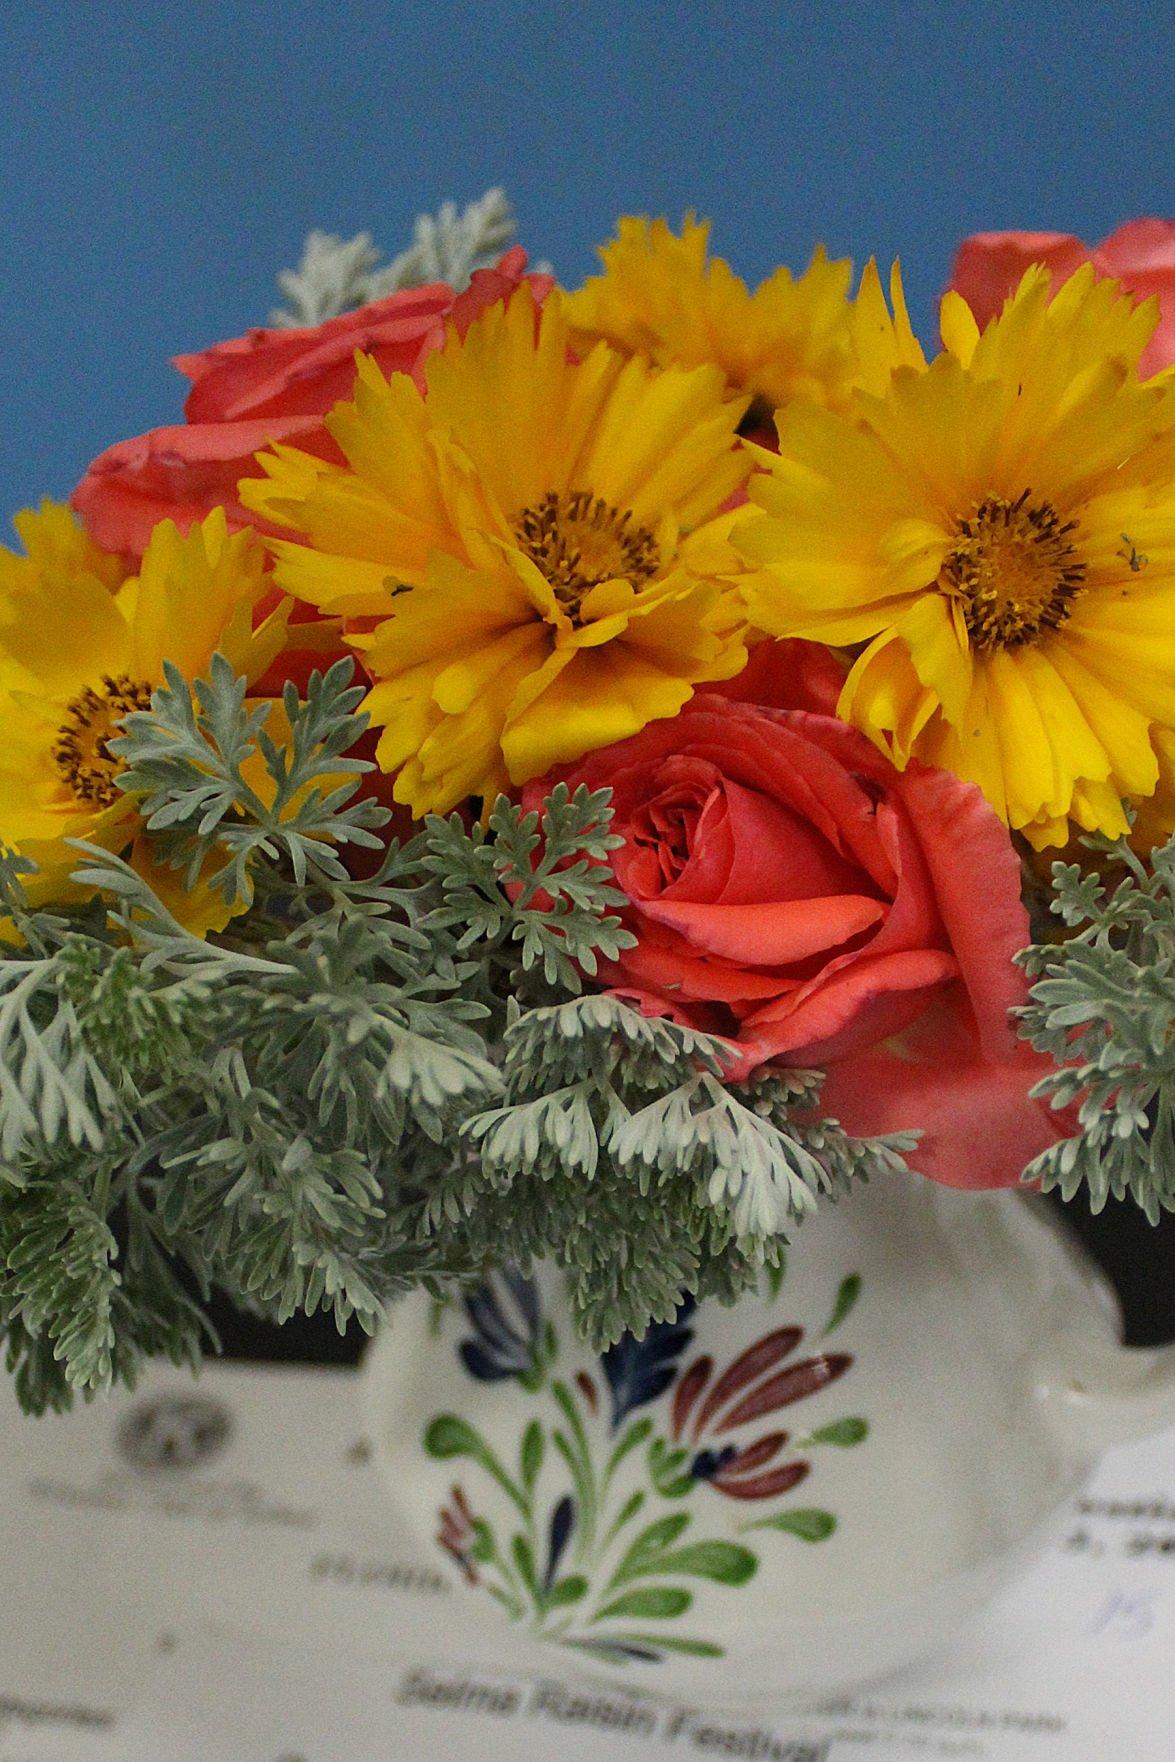 Raisin Festival: Floral